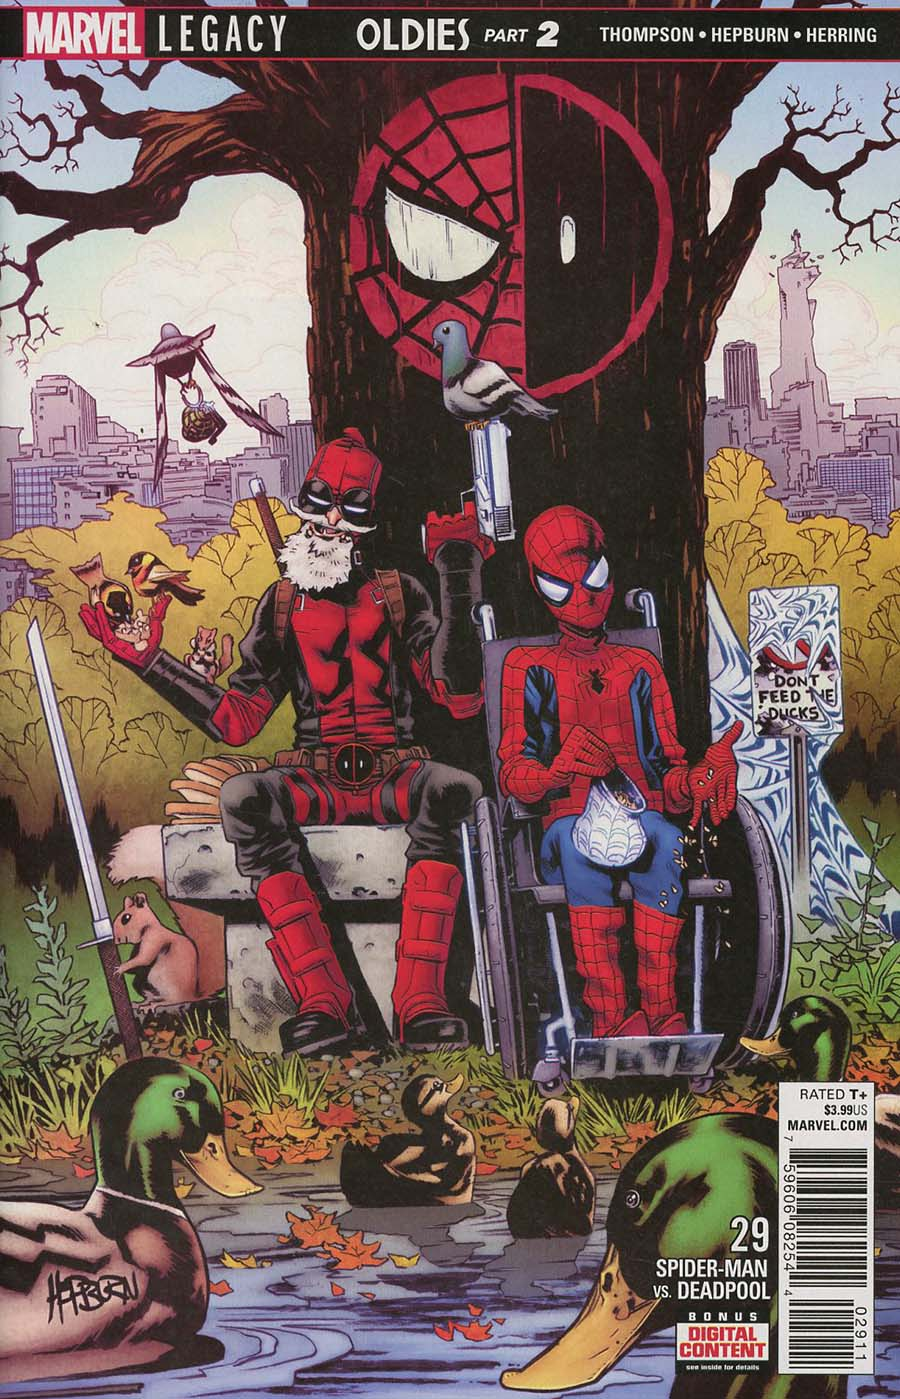 Spider-Man Deadpool #29 (Marvel Legacy Tie-In)